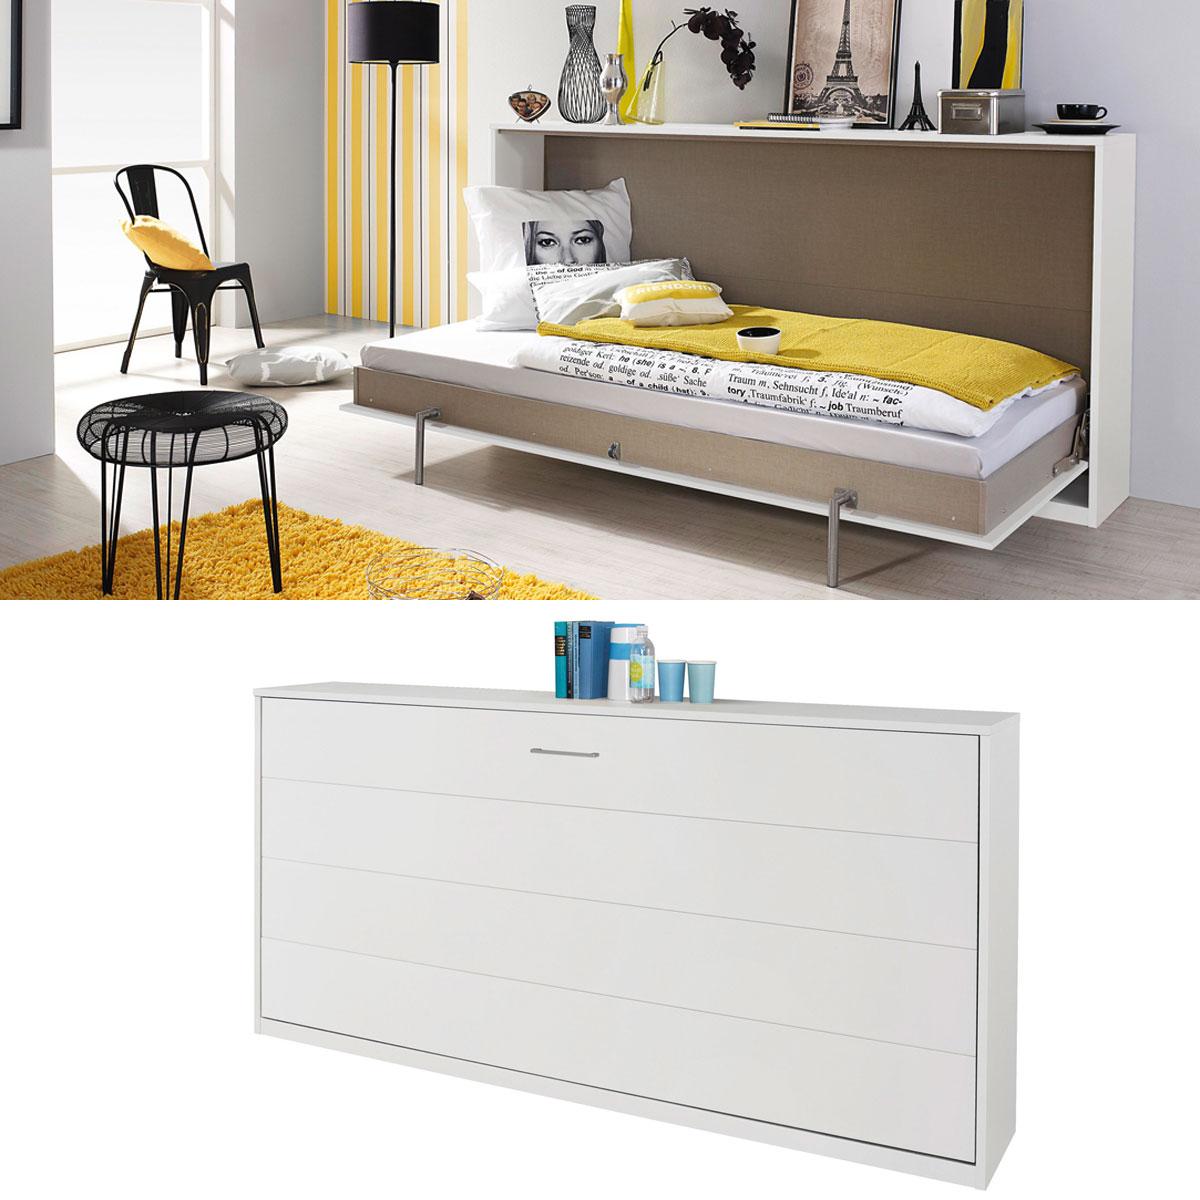 schrankbett albero 90x200cm 7 designs funktionsbett. Black Bedroom Furniture Sets. Home Design Ideas